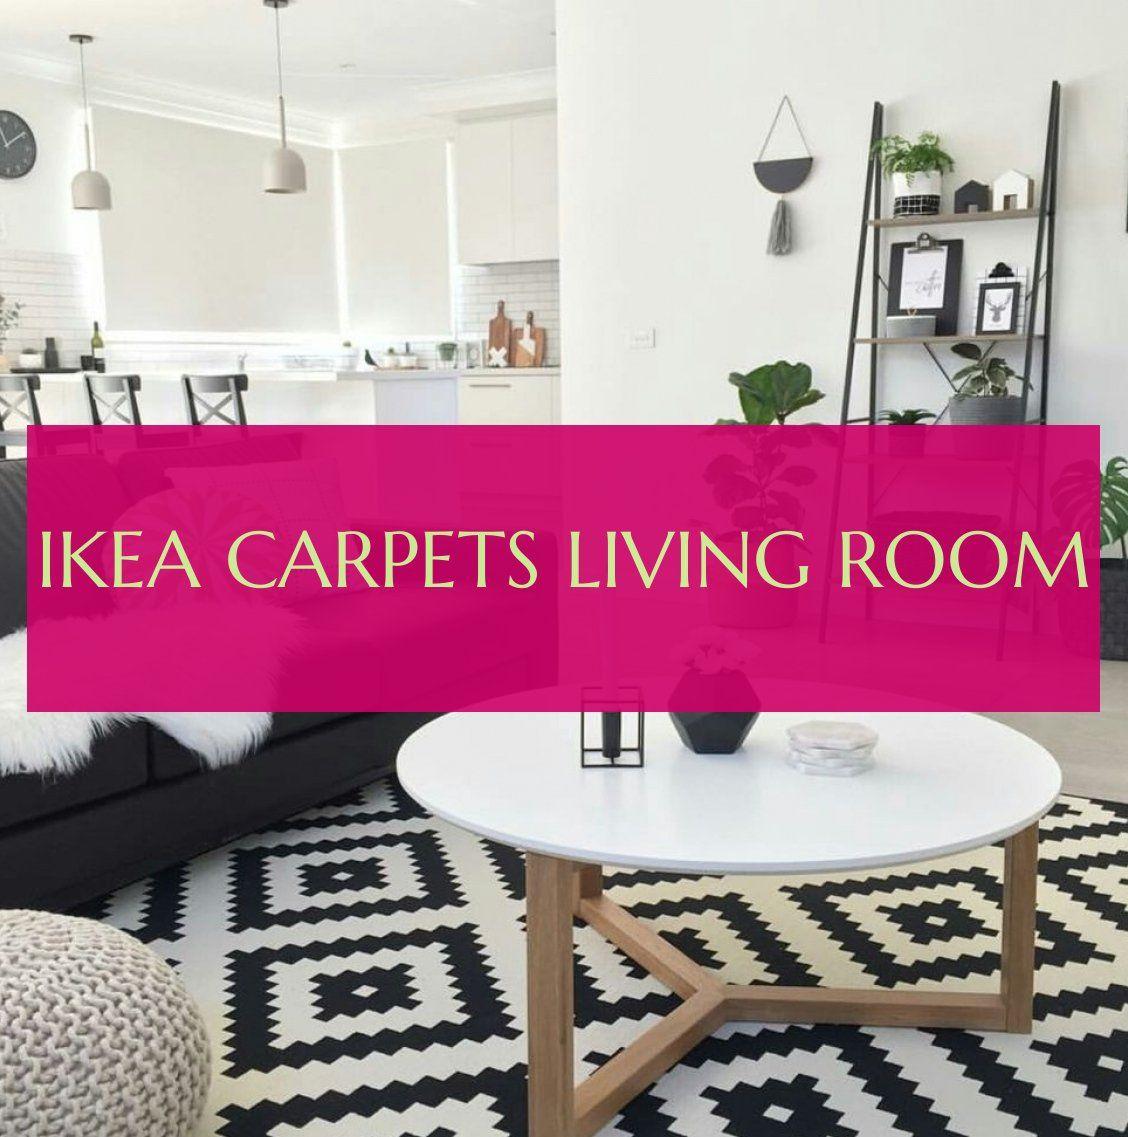 Ikea Carpets Living Room Ikea Teppiche Wohnzimmer Living Room